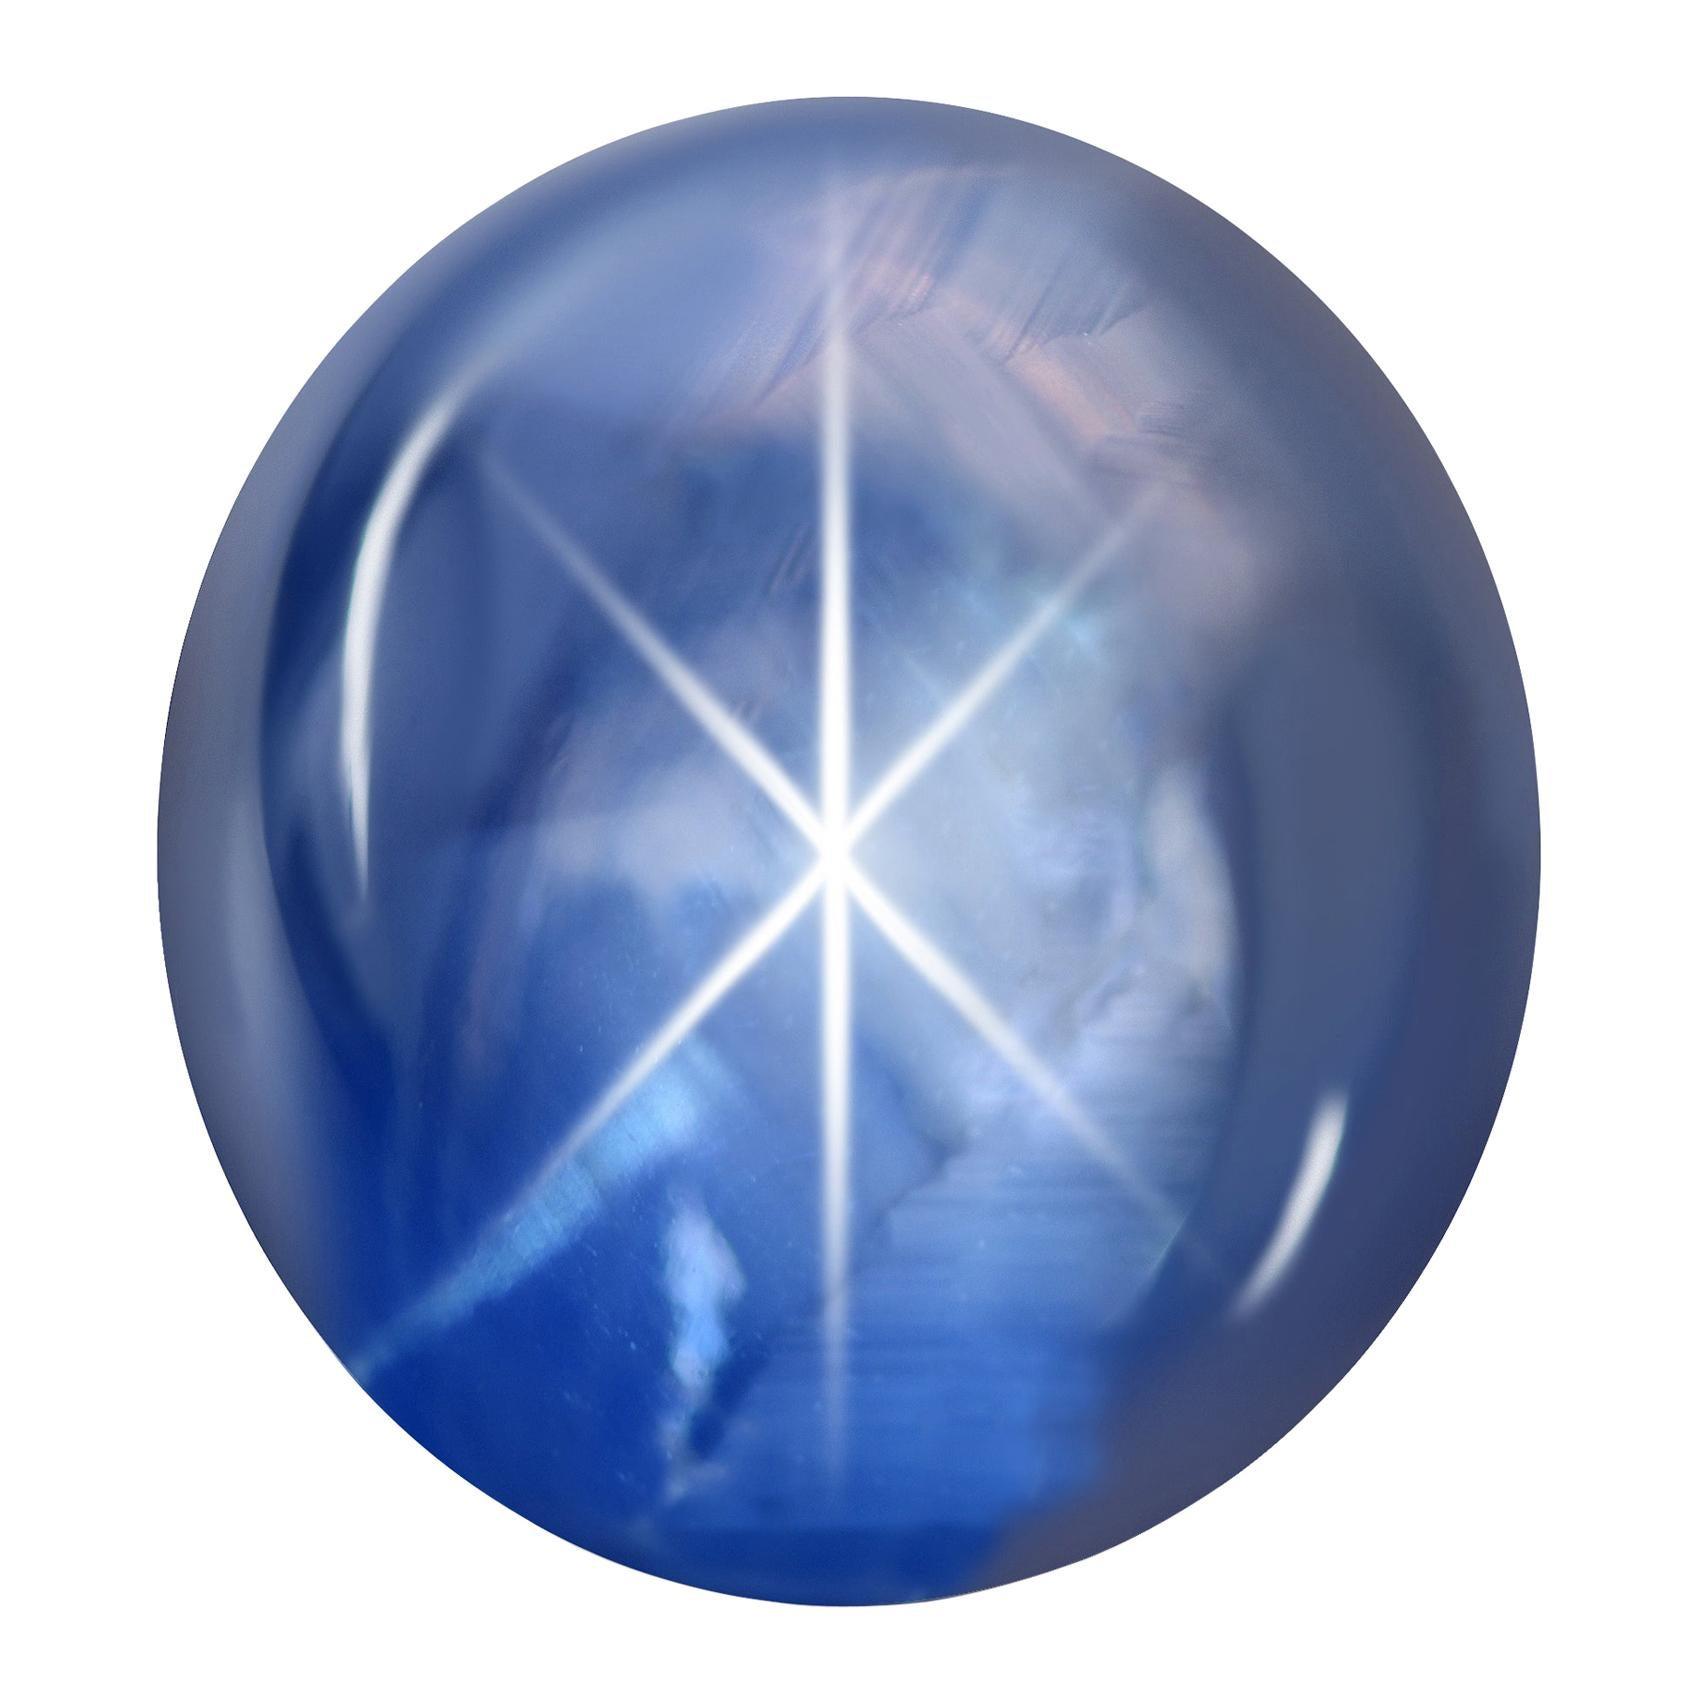 216.34 Carat Natural Sri Lankan Blue Star Sapphire GRS Certificate